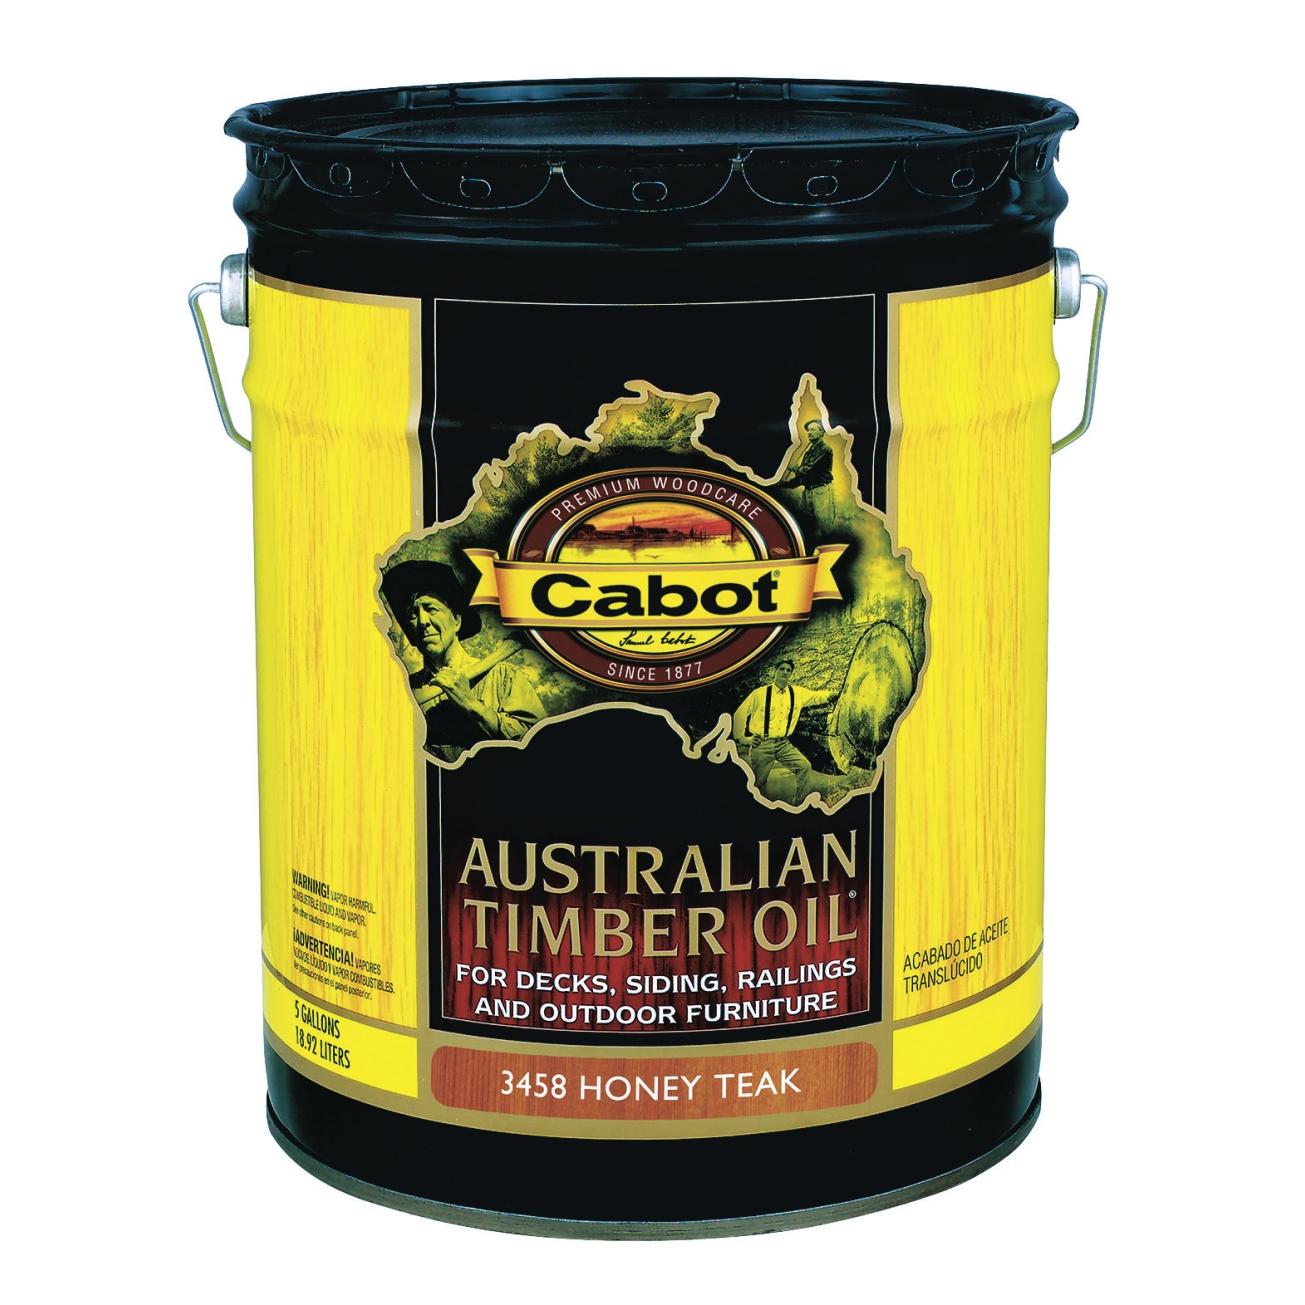 Cabot Australian TimberOil 5 Gallon